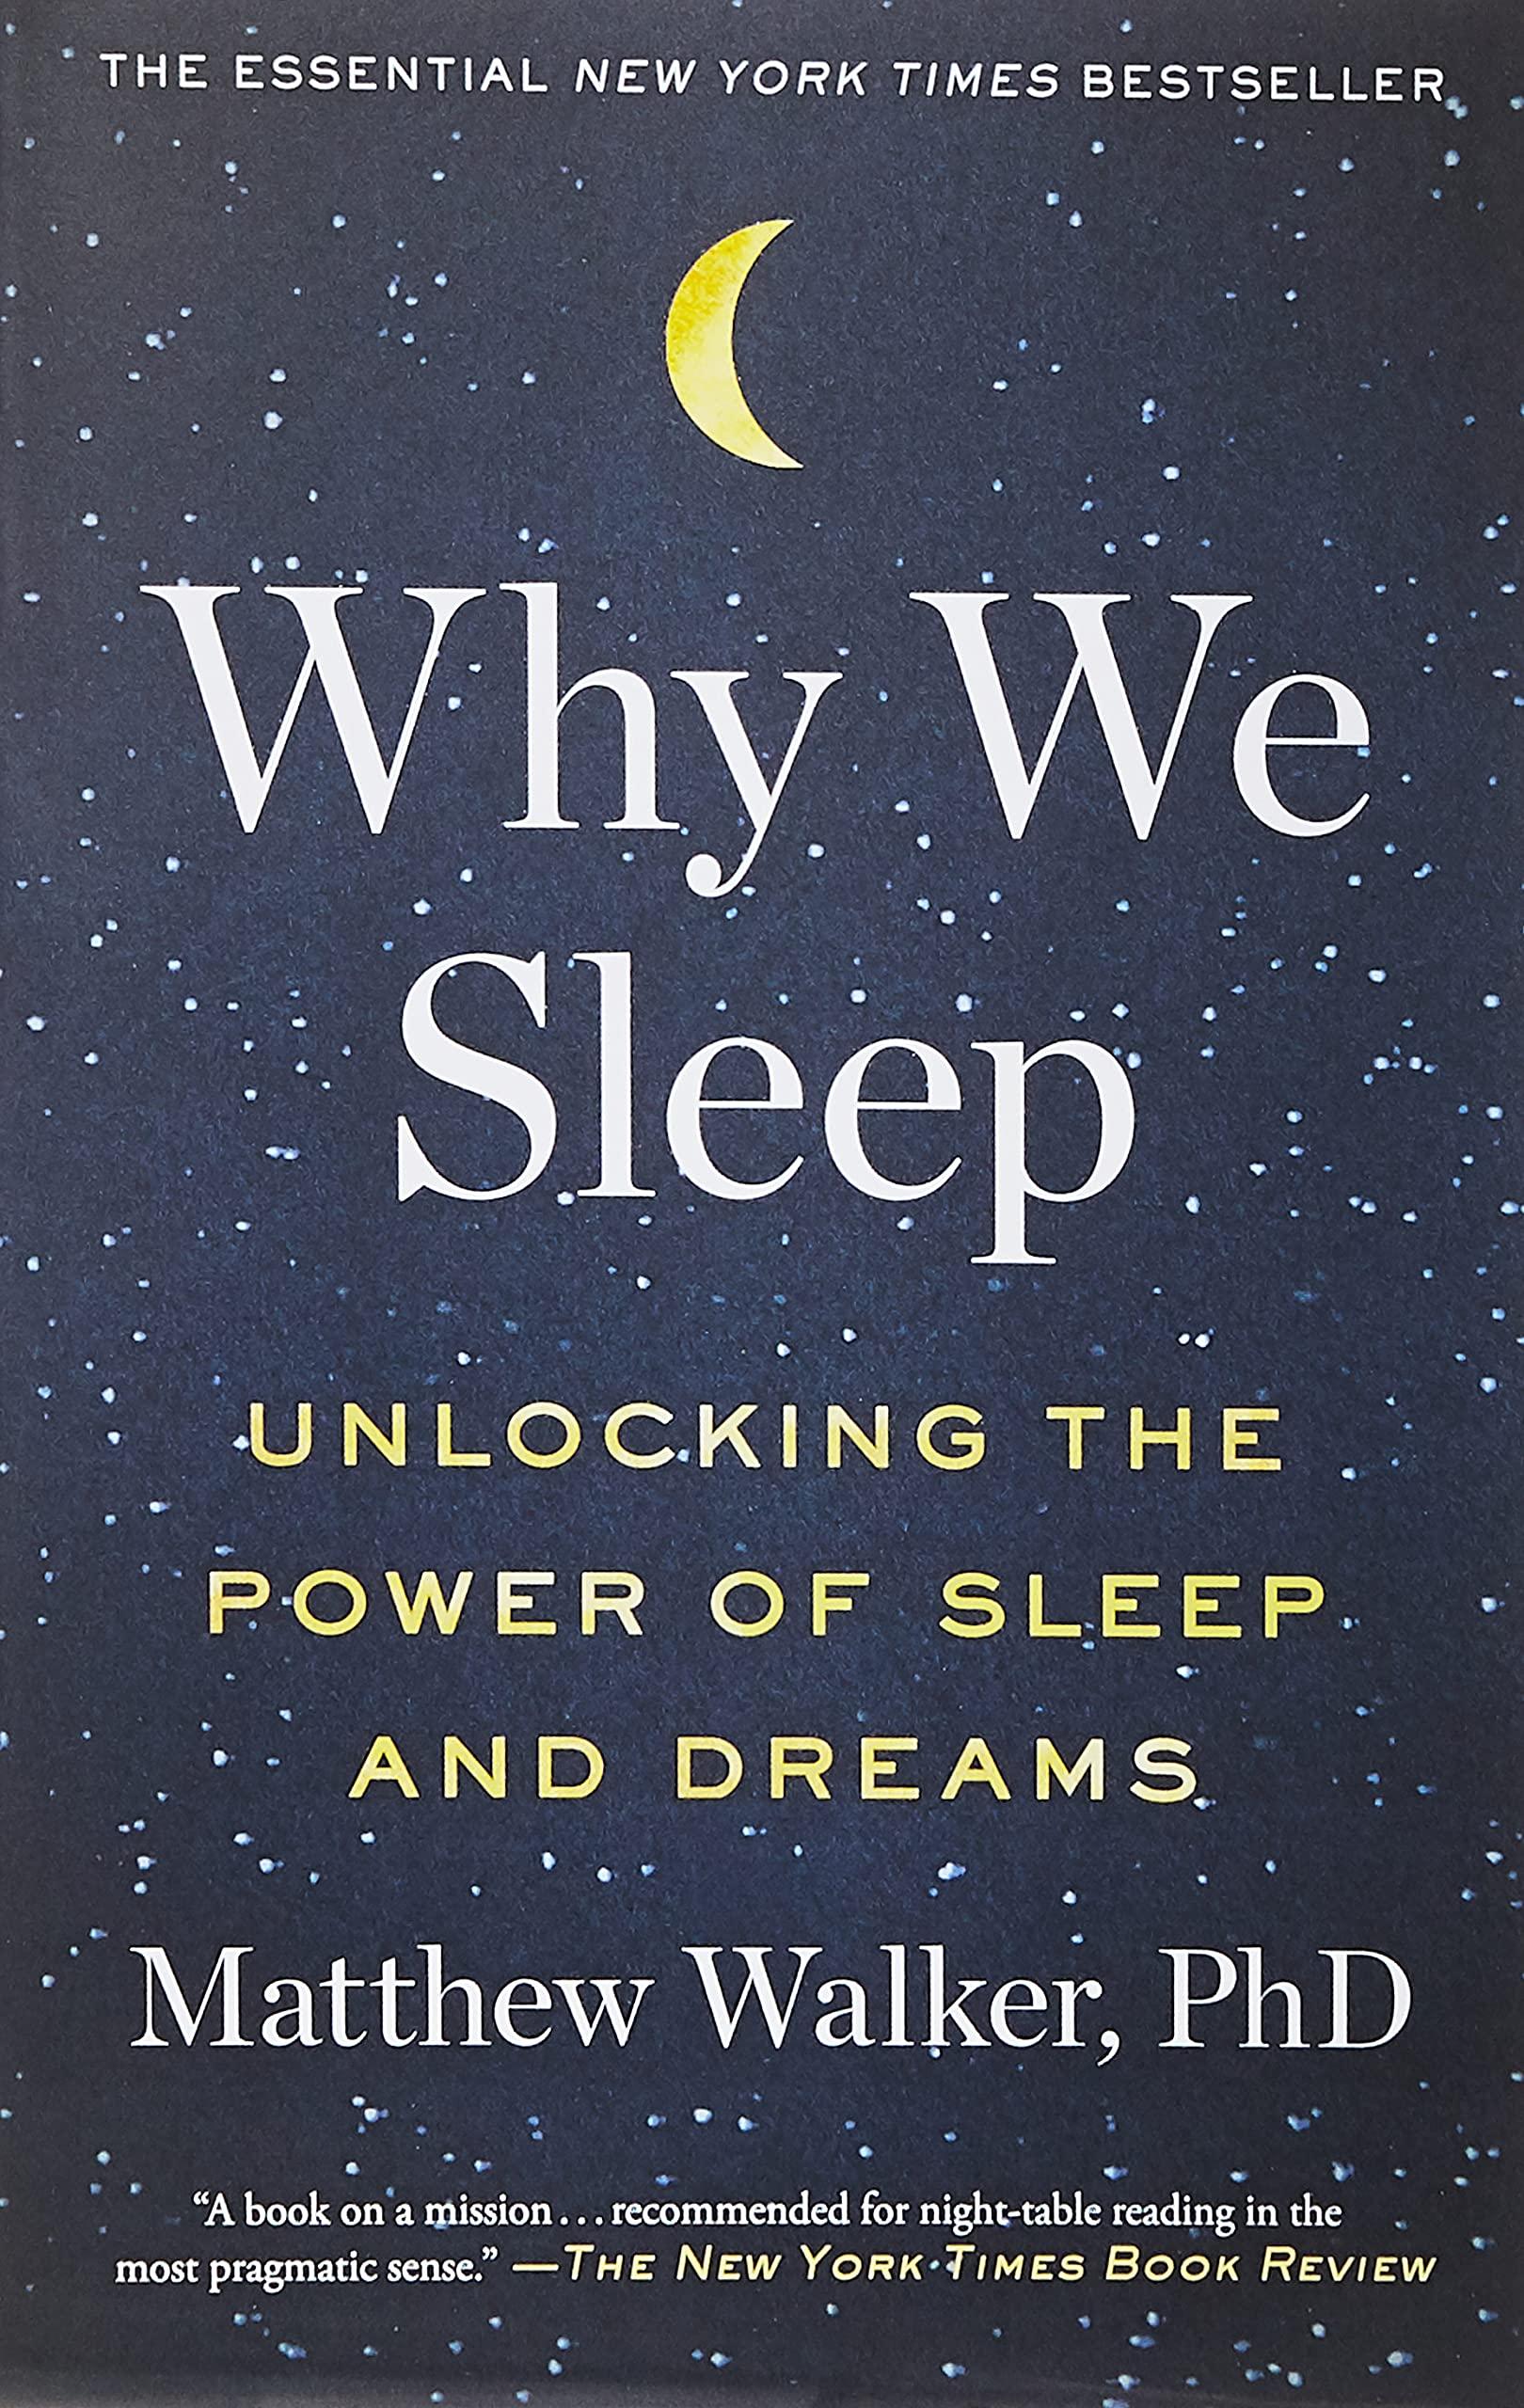 Top 10 Best why we sleep book matthew walker Reviews